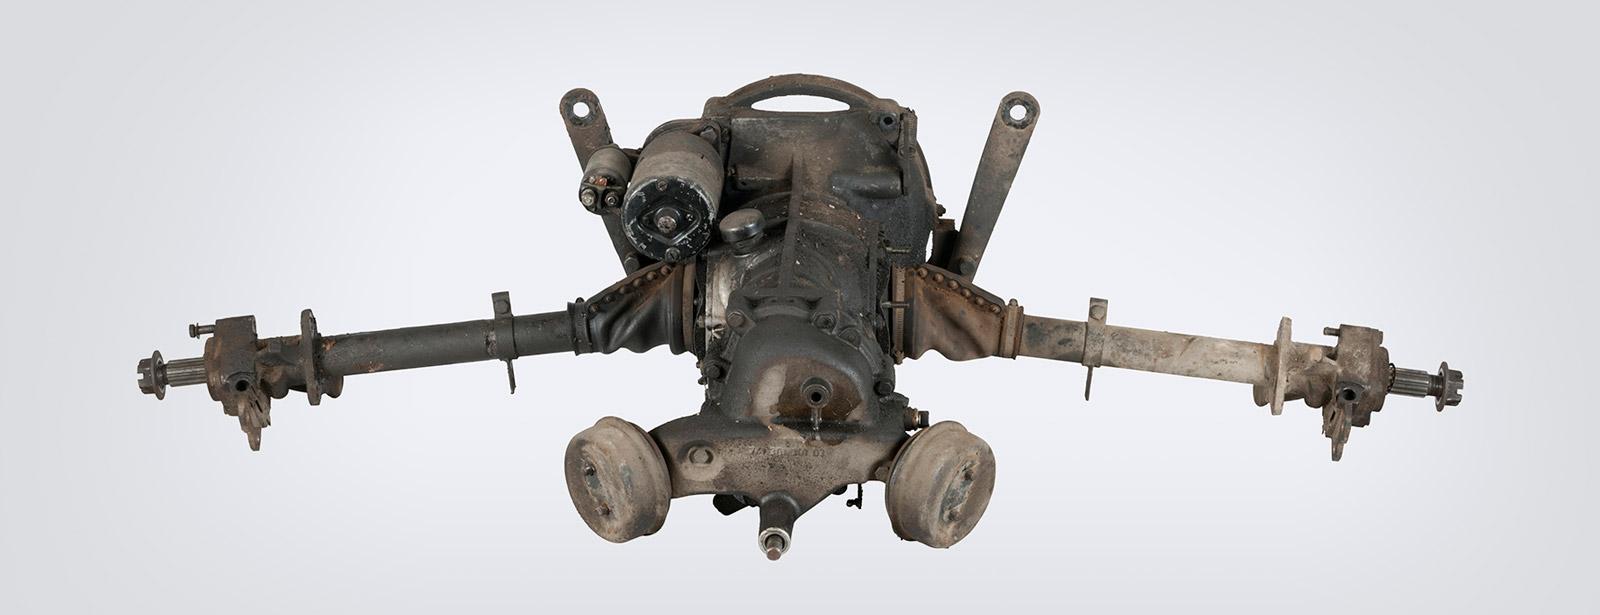 Porsche - Boîte de vitesses - Entrée